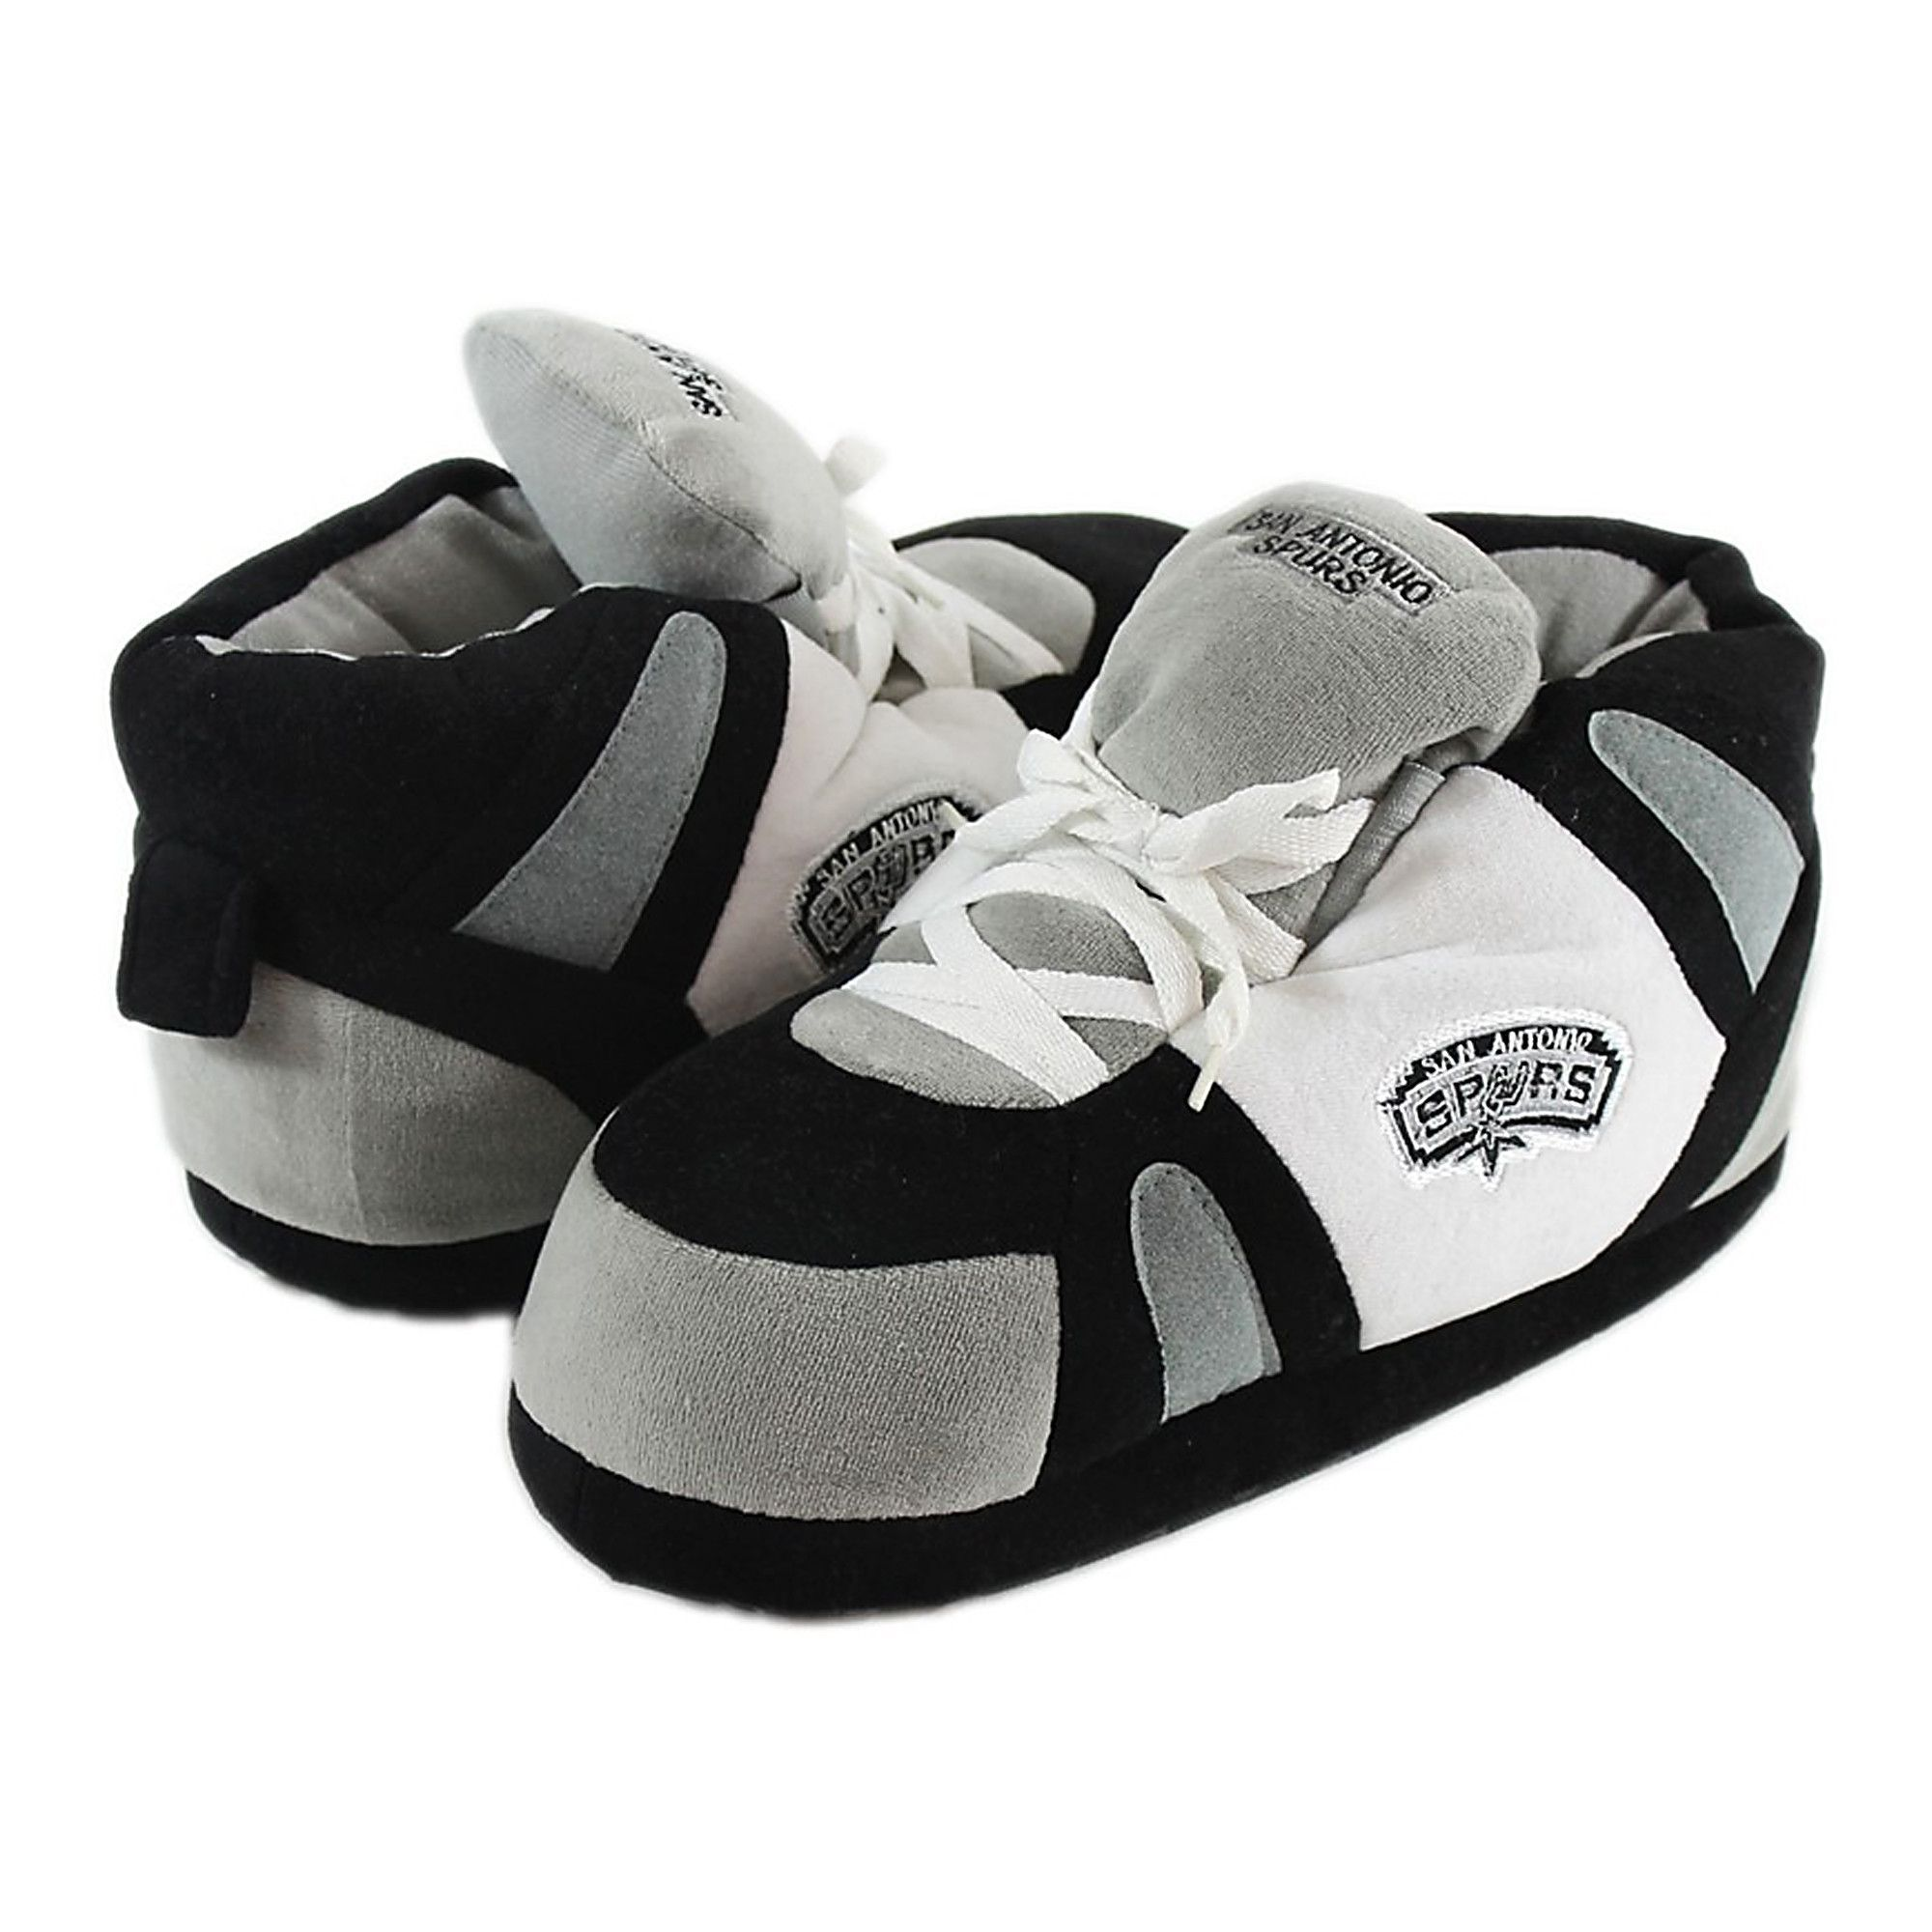 c61fcde18b5c San Antonio Spurs NBA Slippers by Comfy Feet